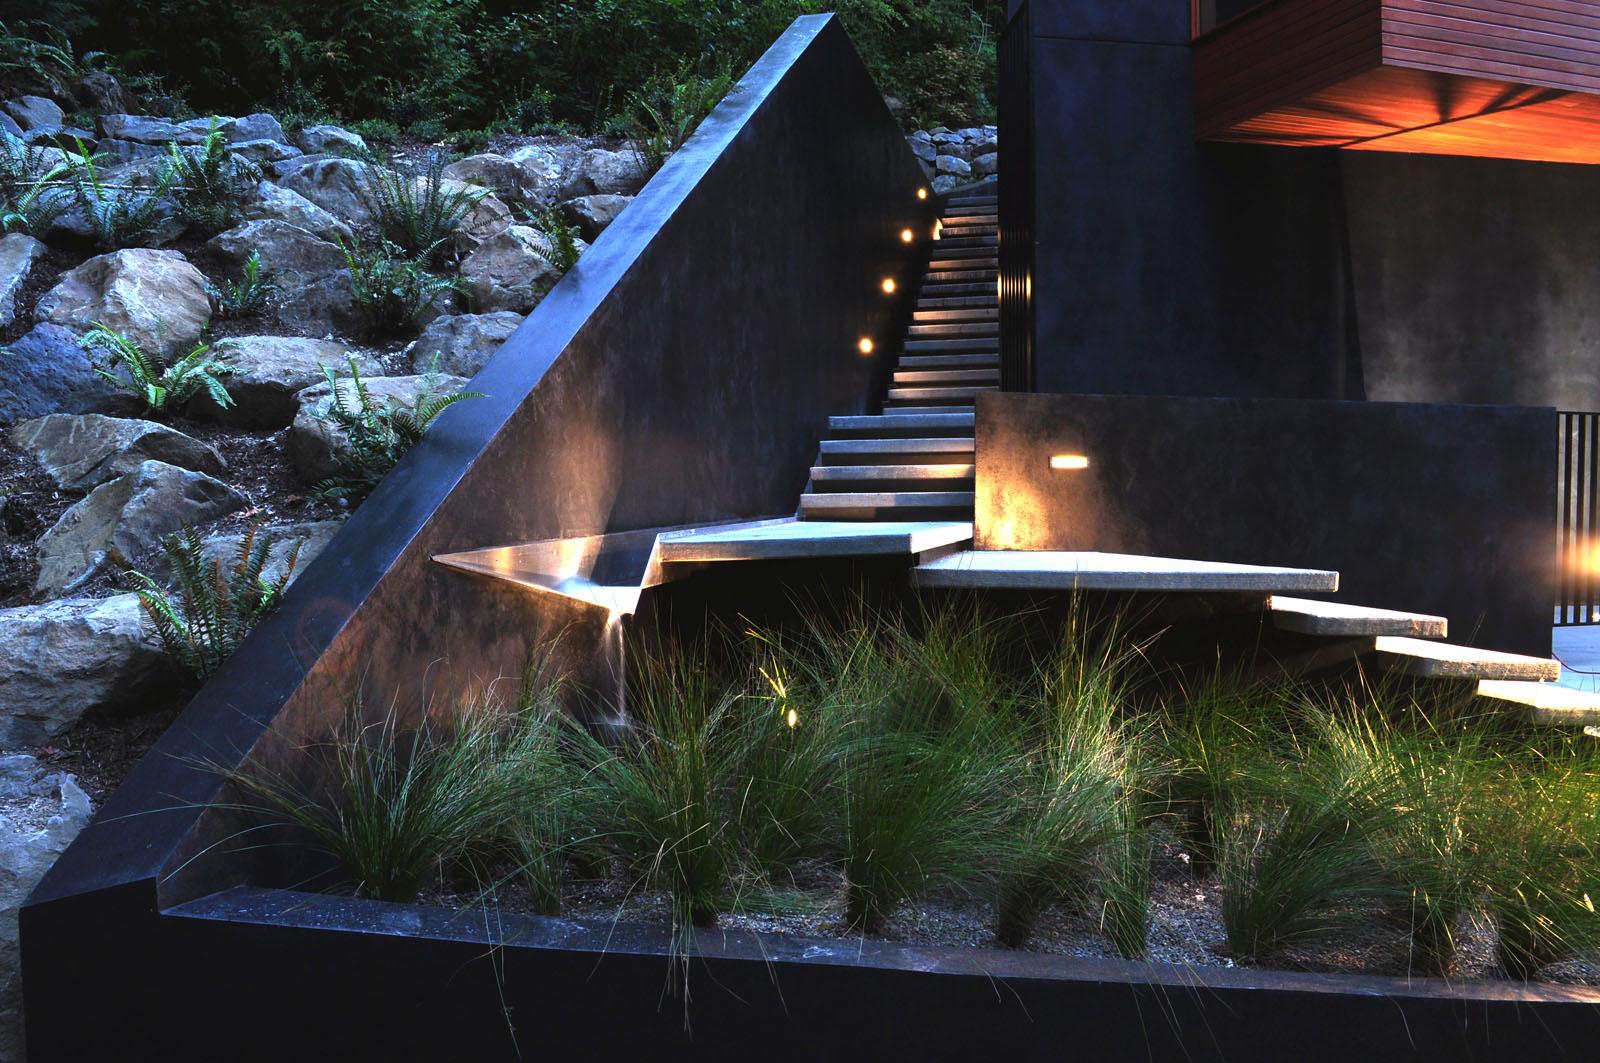 Location: Portland, OR; Architect: Skylab Architecture